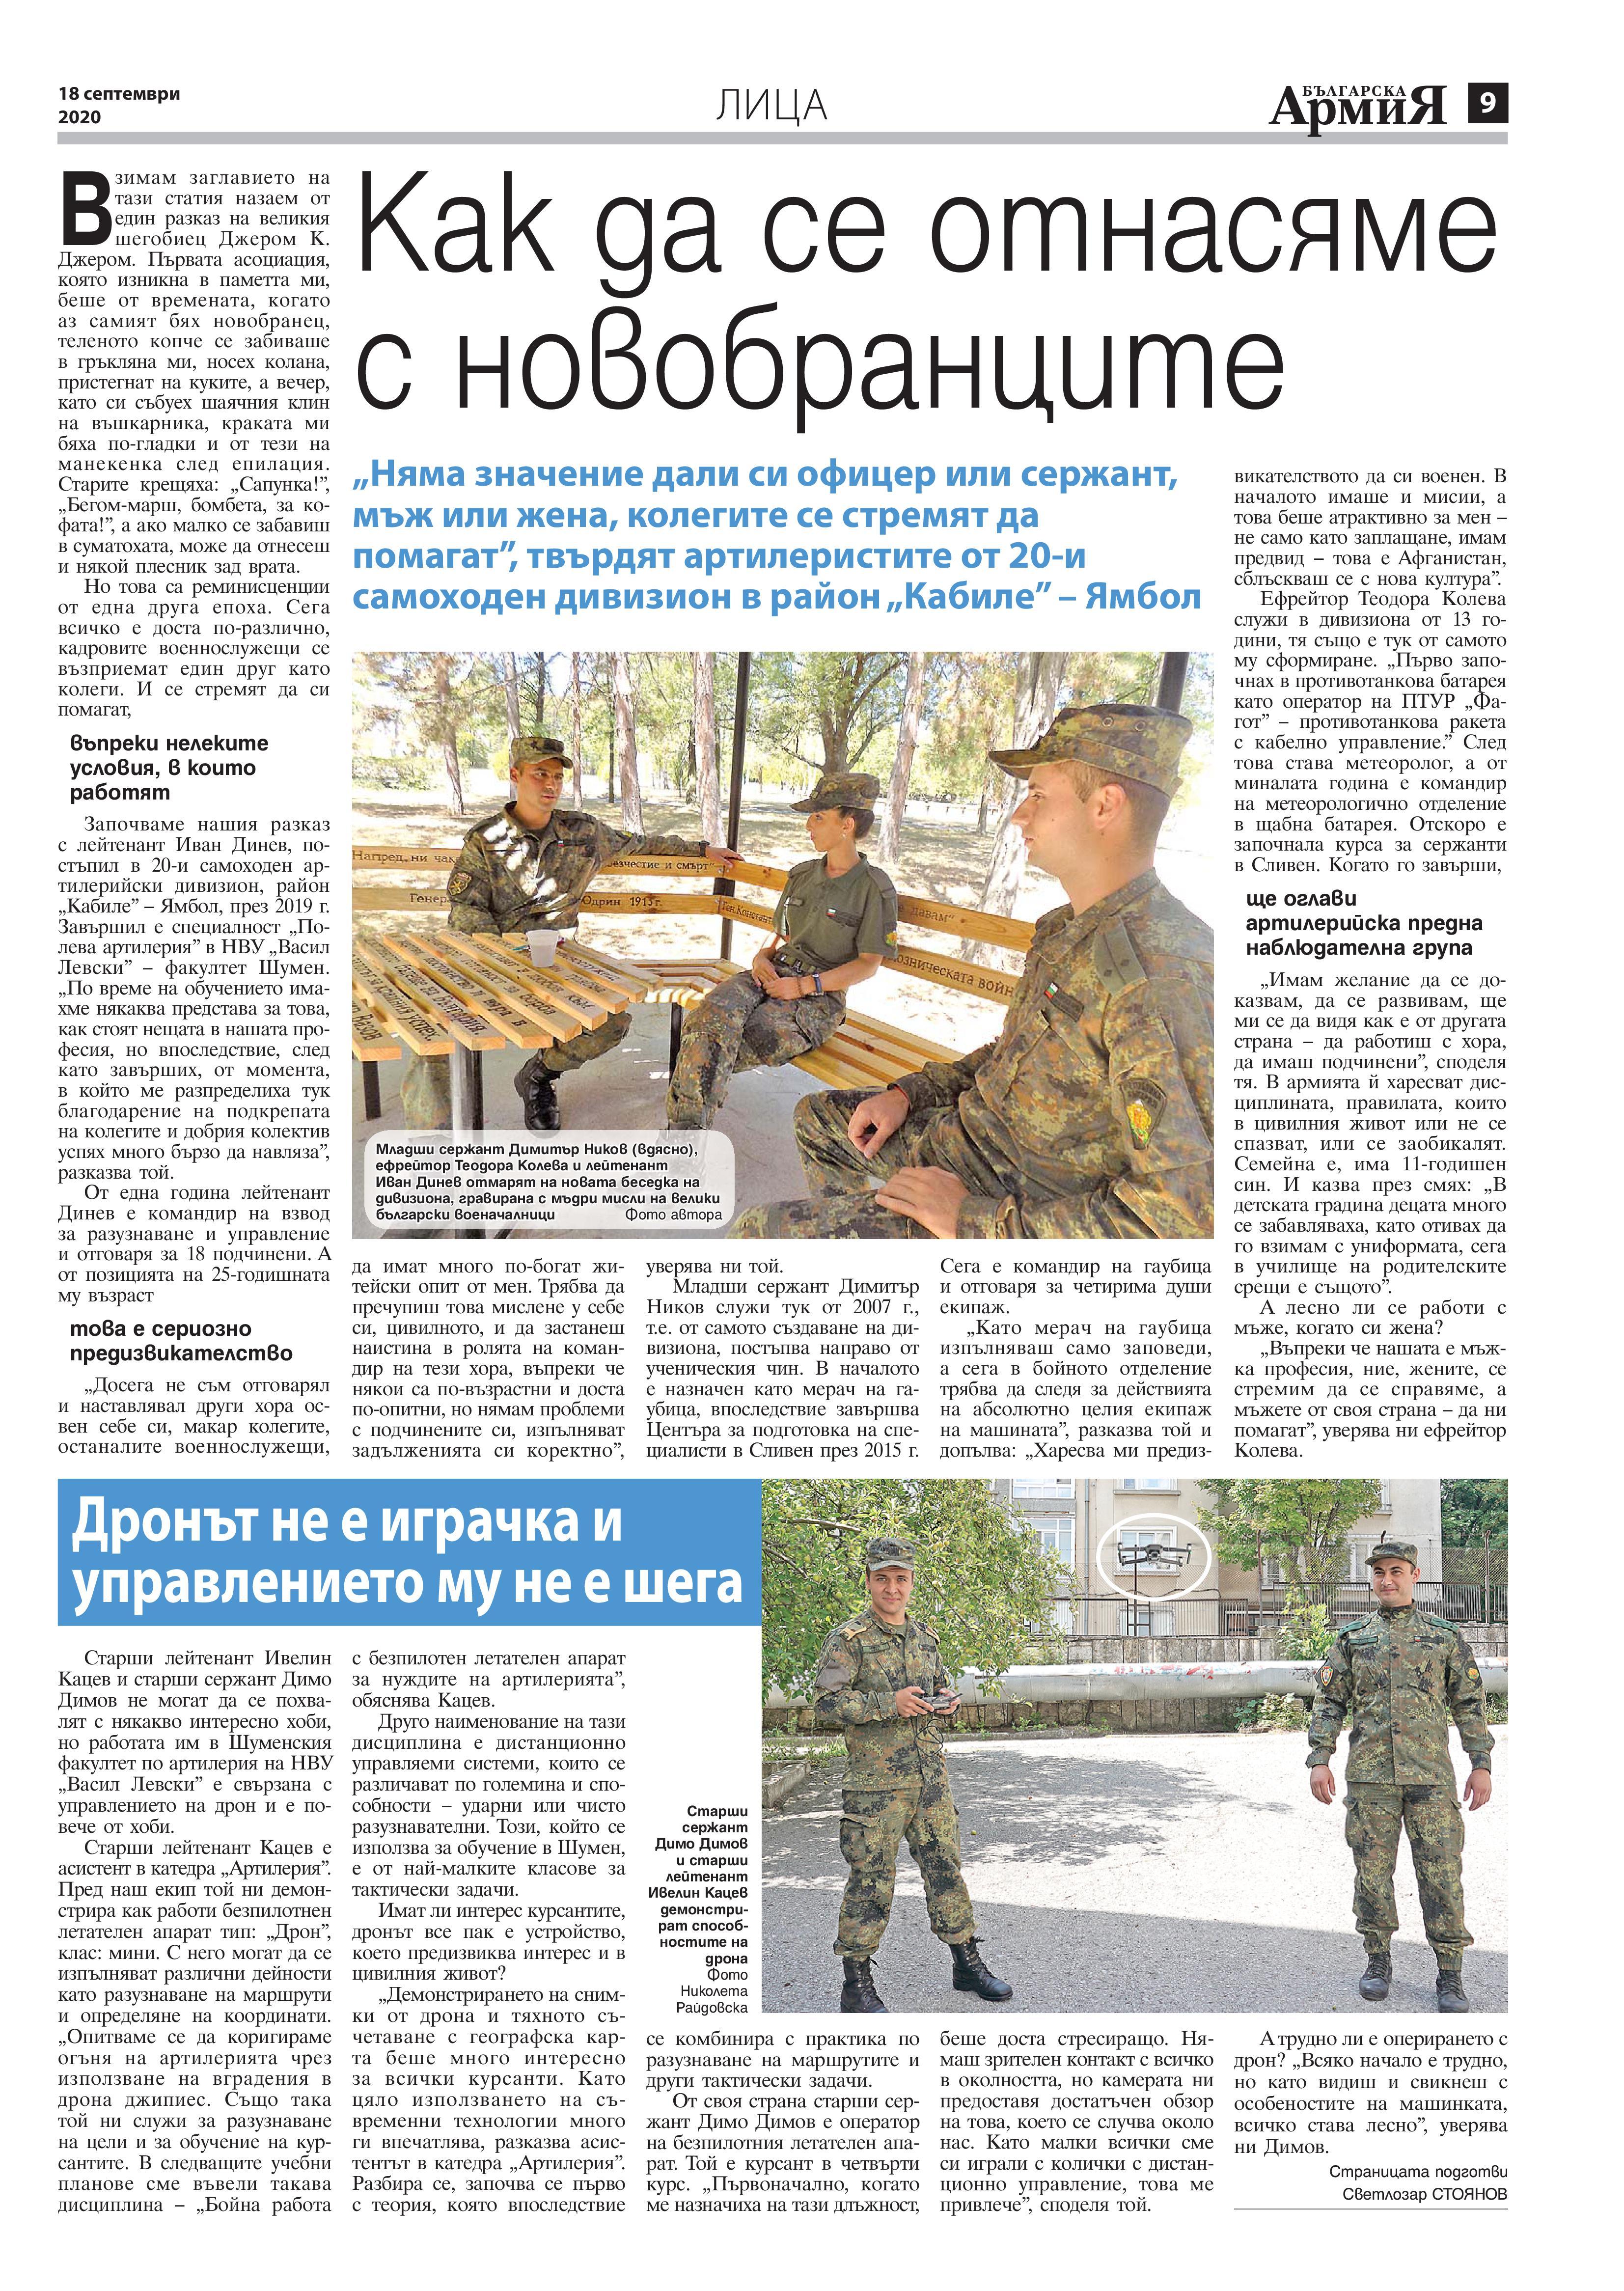 https://armymedia.bg/wp-content/uploads/2015/06/09-40.jpg